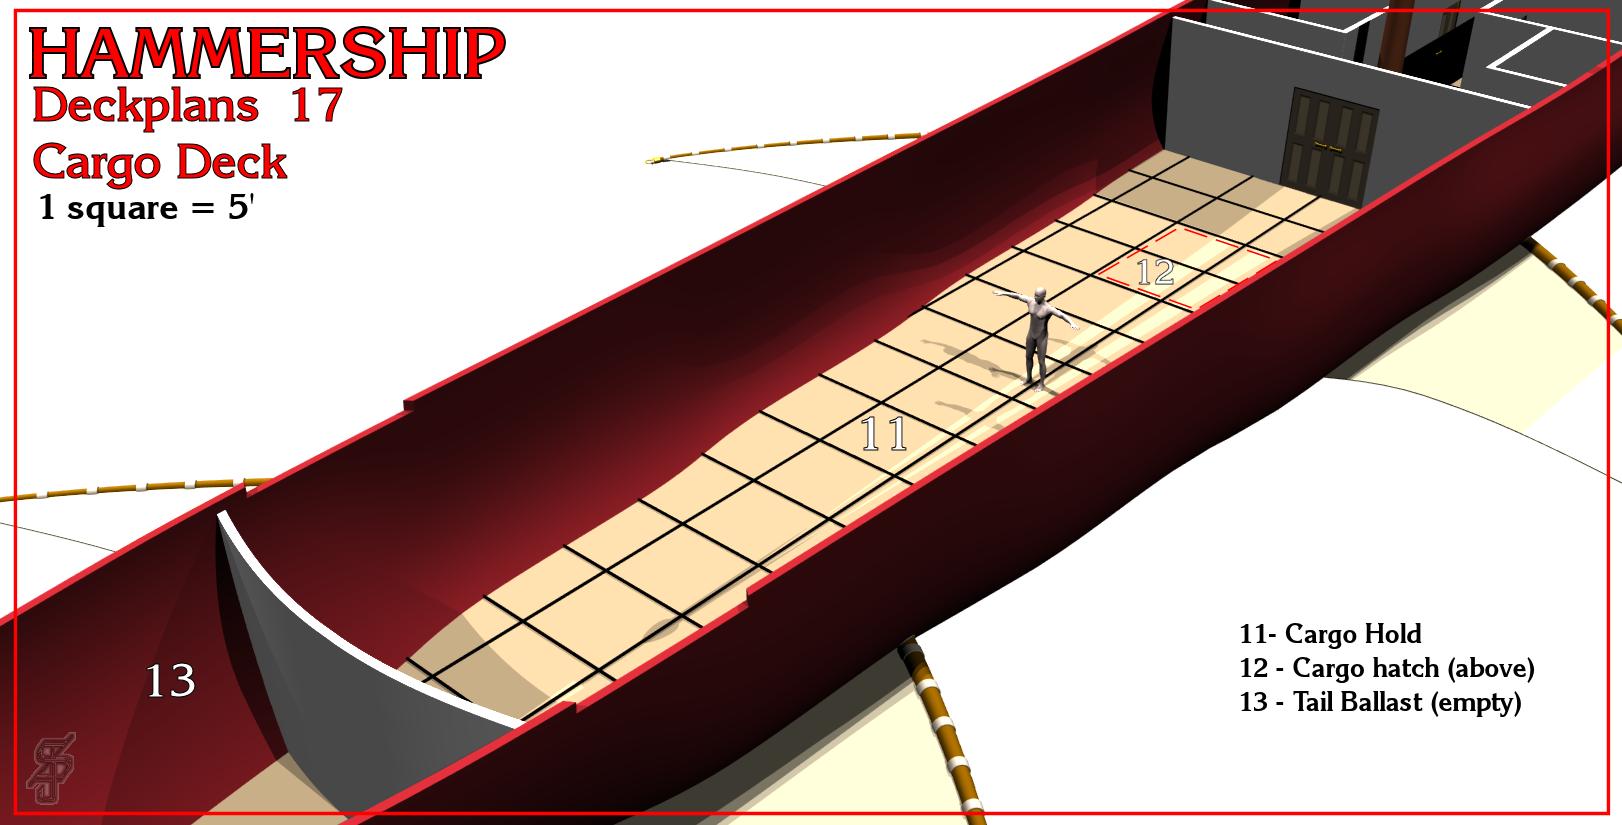 Hammership layout 17